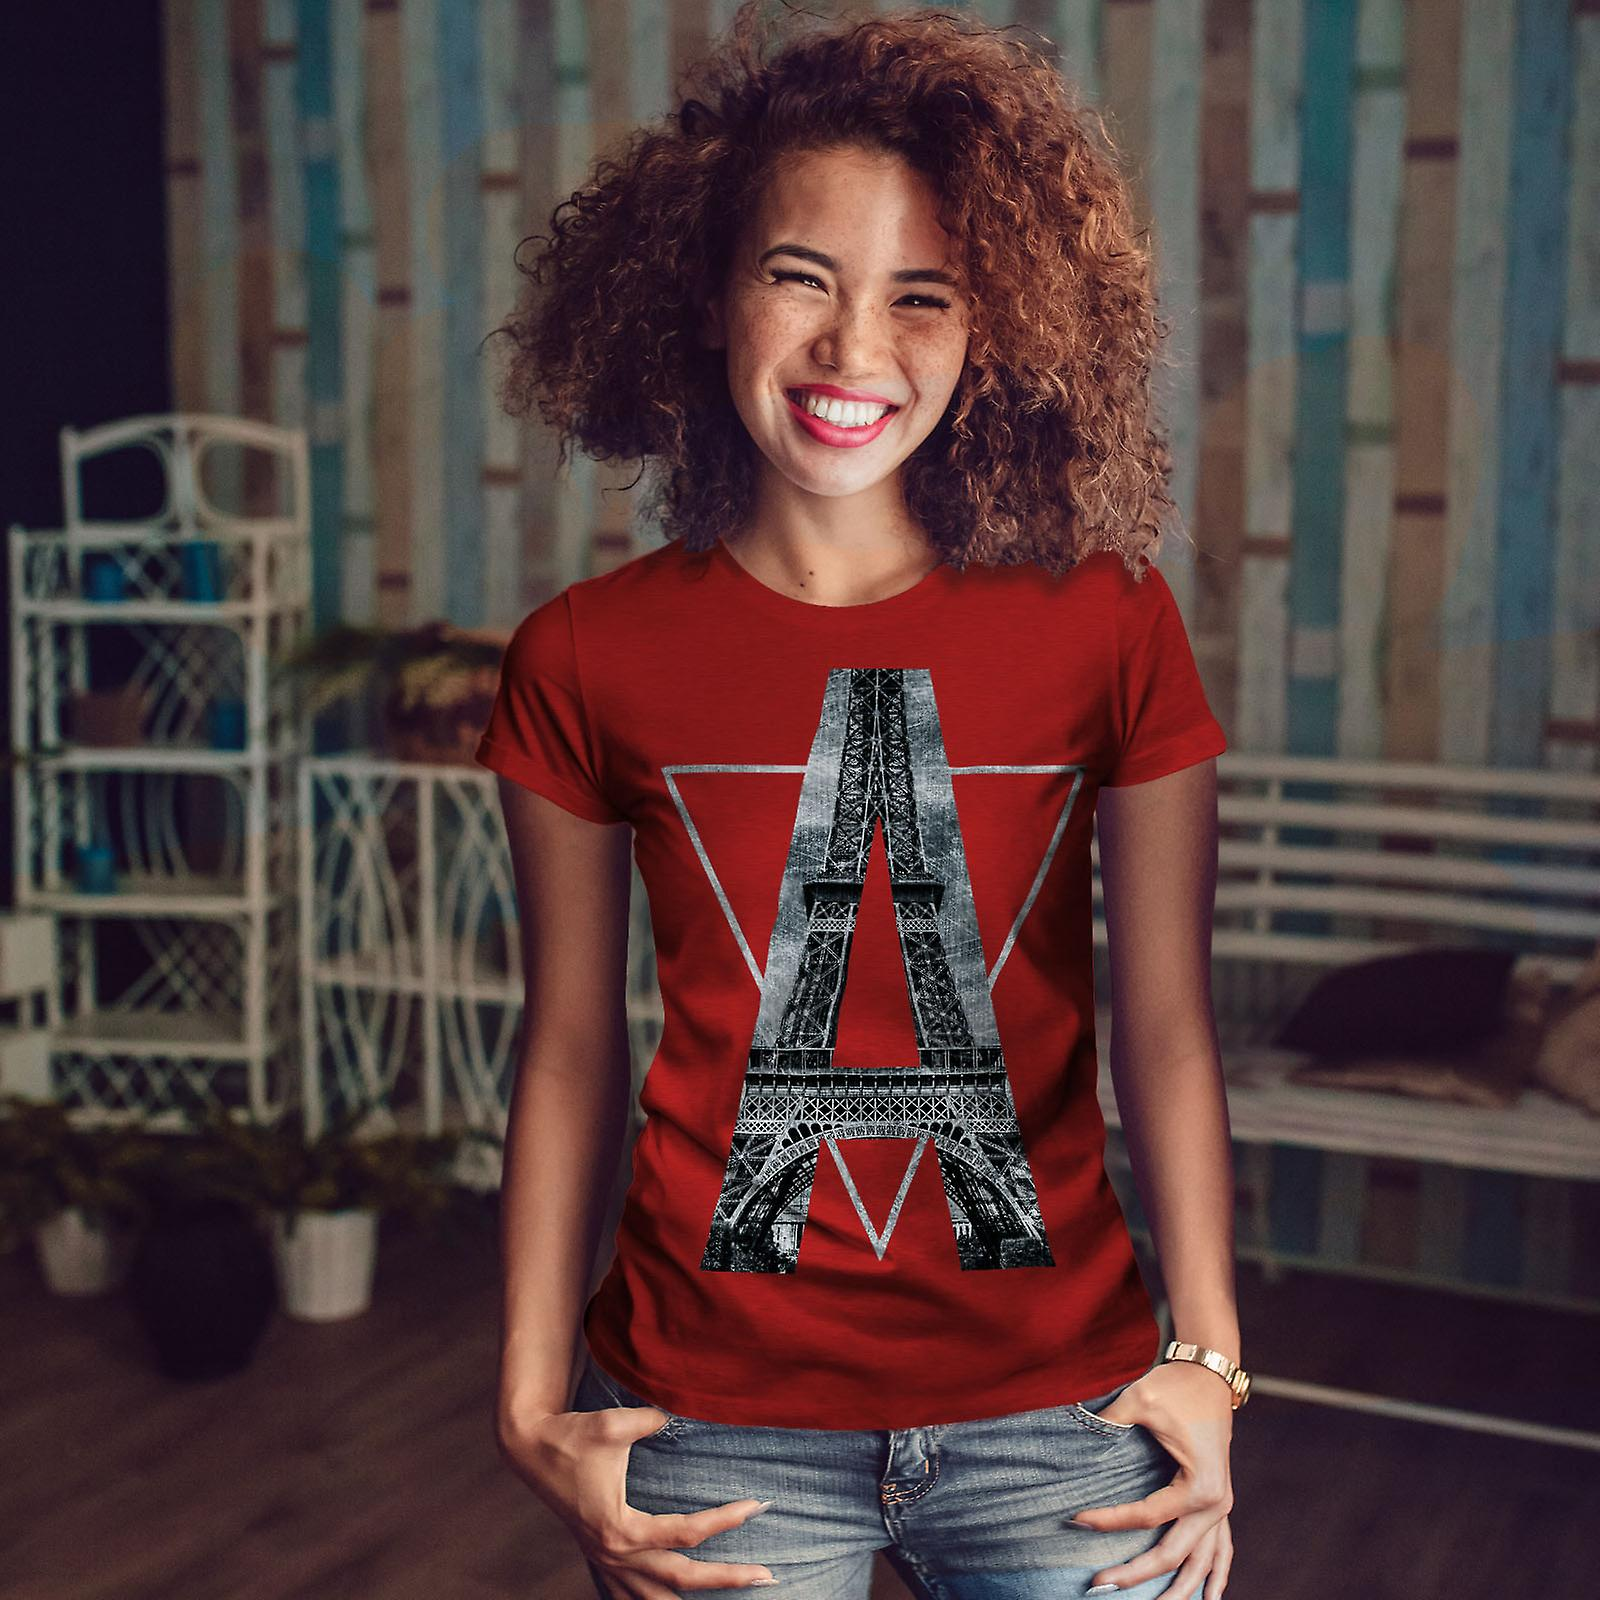 Paris historique Art RedT-chemise femme | Wellcoda